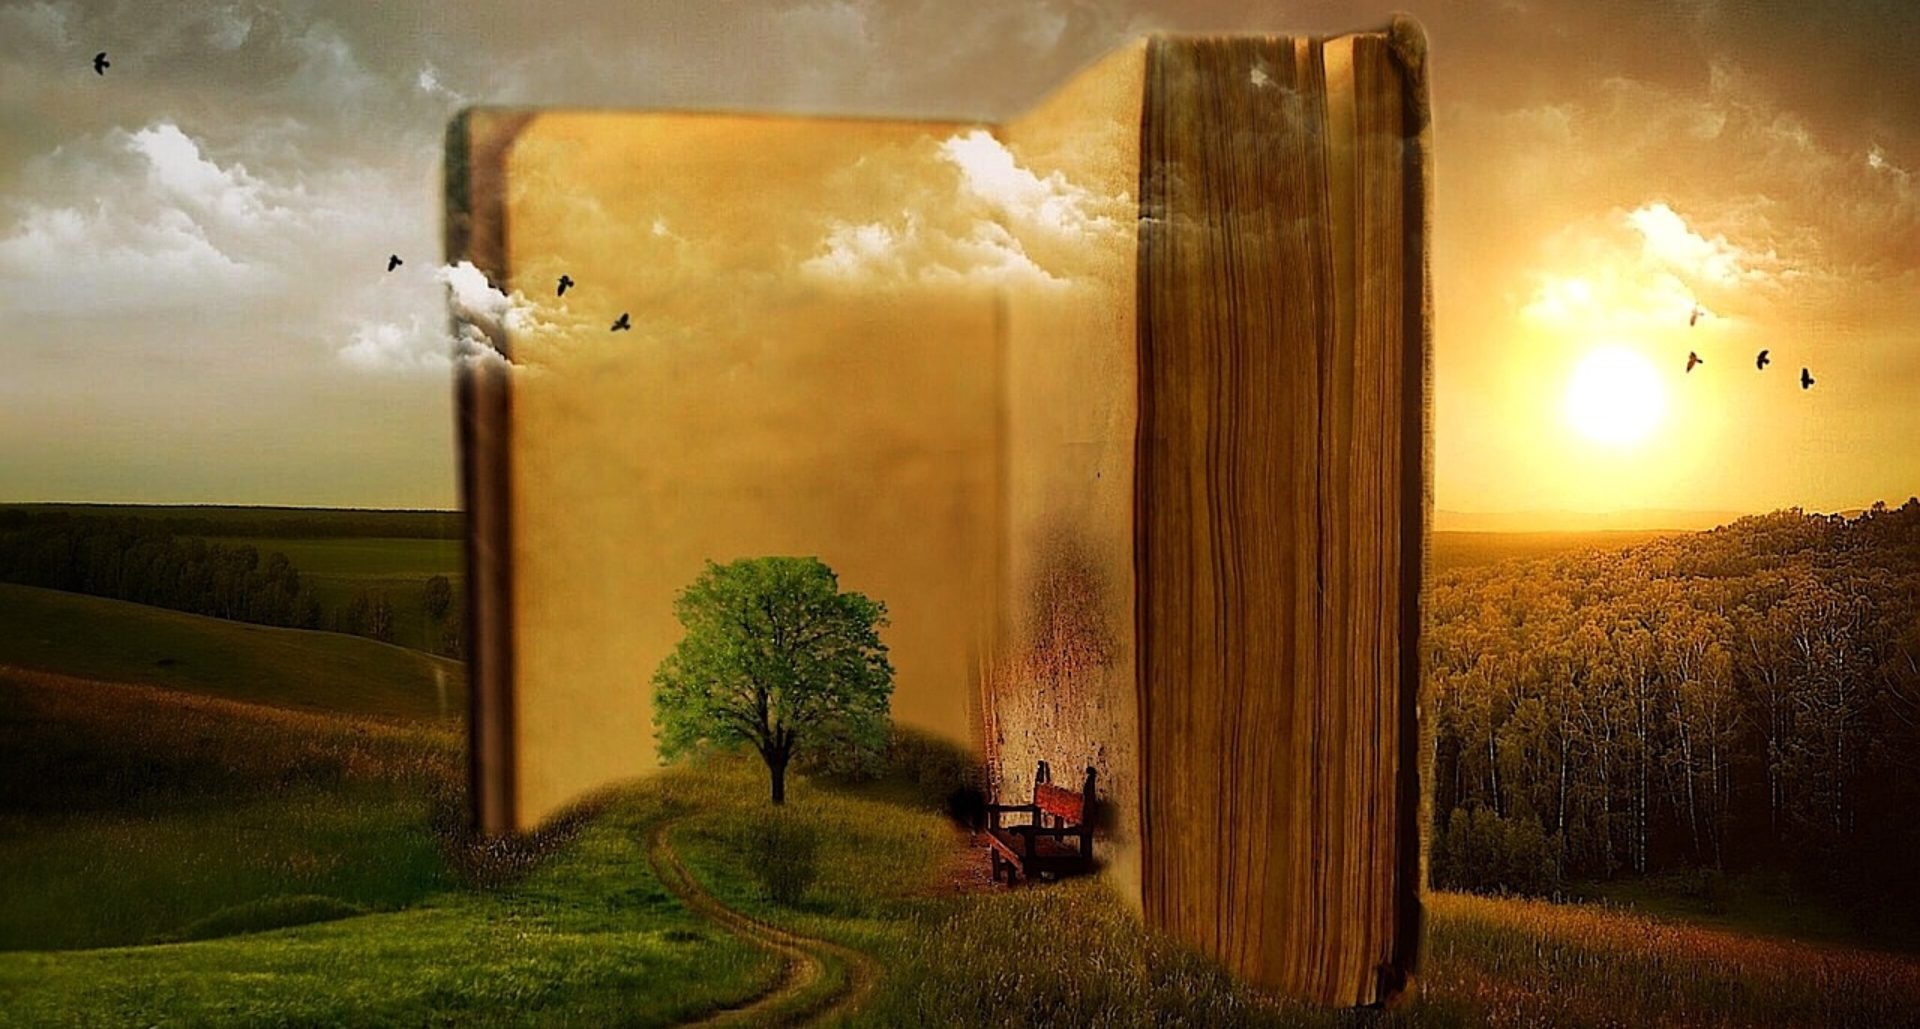 cropped-book-863418_1280.jpg